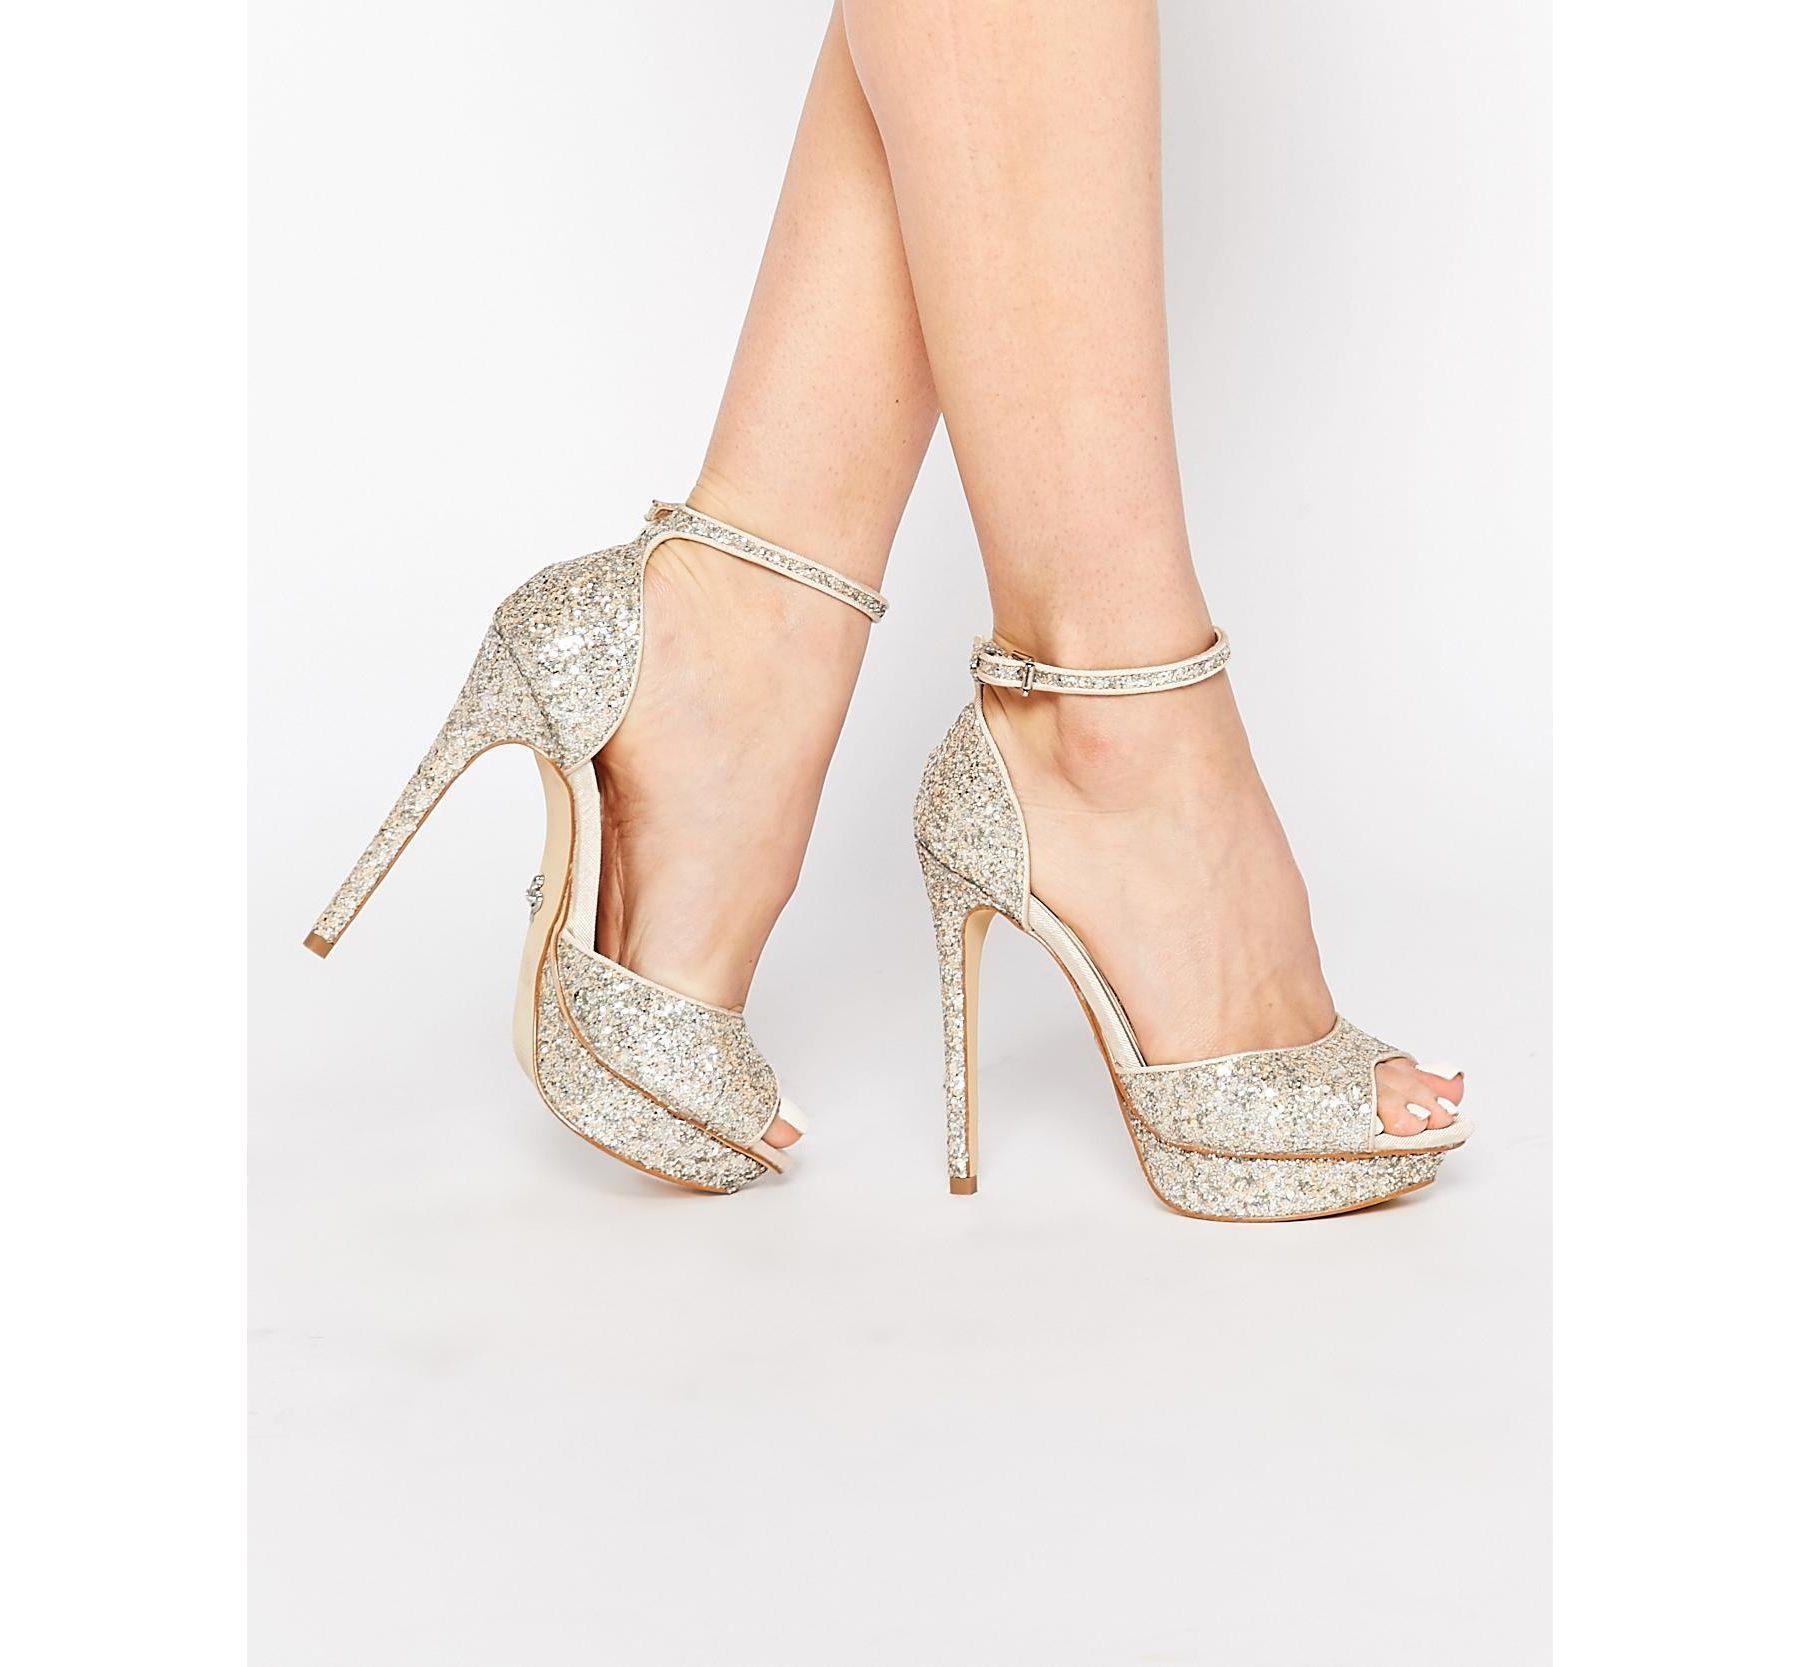 1daba3e24ed9 Lyst - Lipsy Molly Silver Glitter Platform Heeled Sandals in Metallic